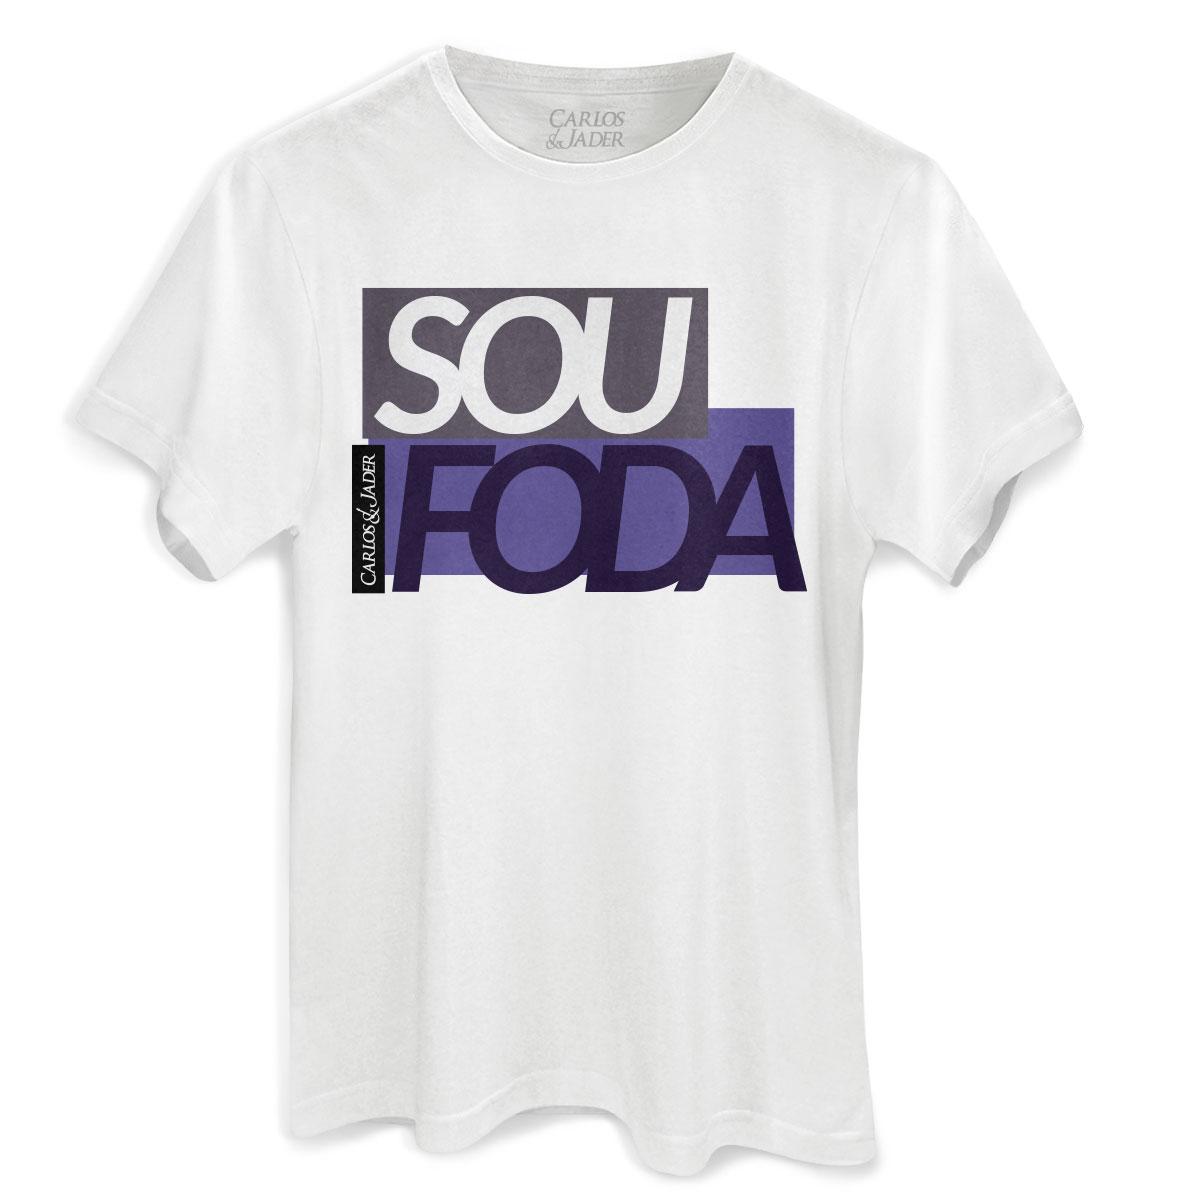 Camiseta Masculina Carlos & Jader Sou Foda